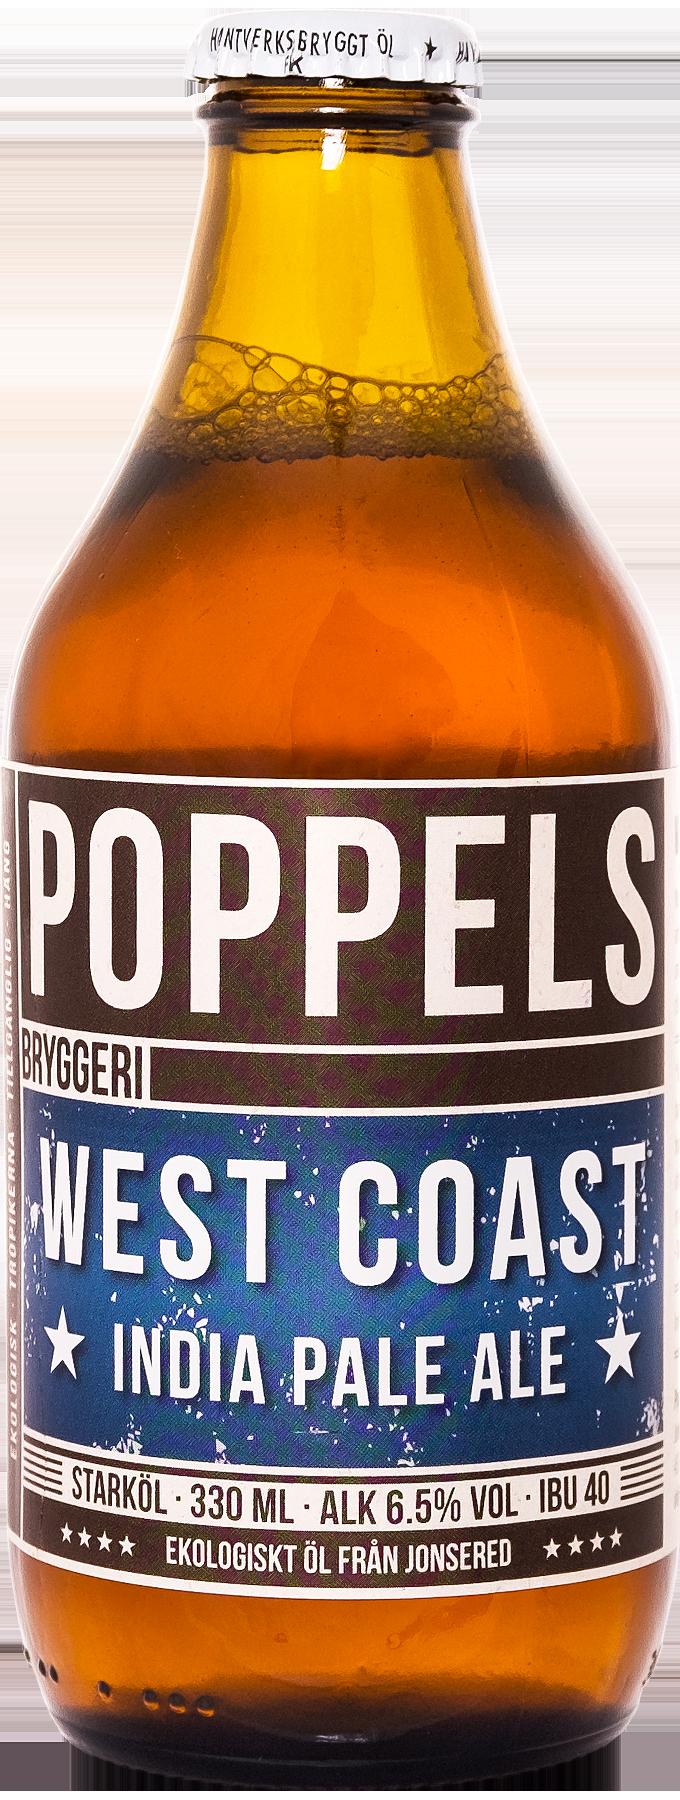 West Coast India Pale Ale